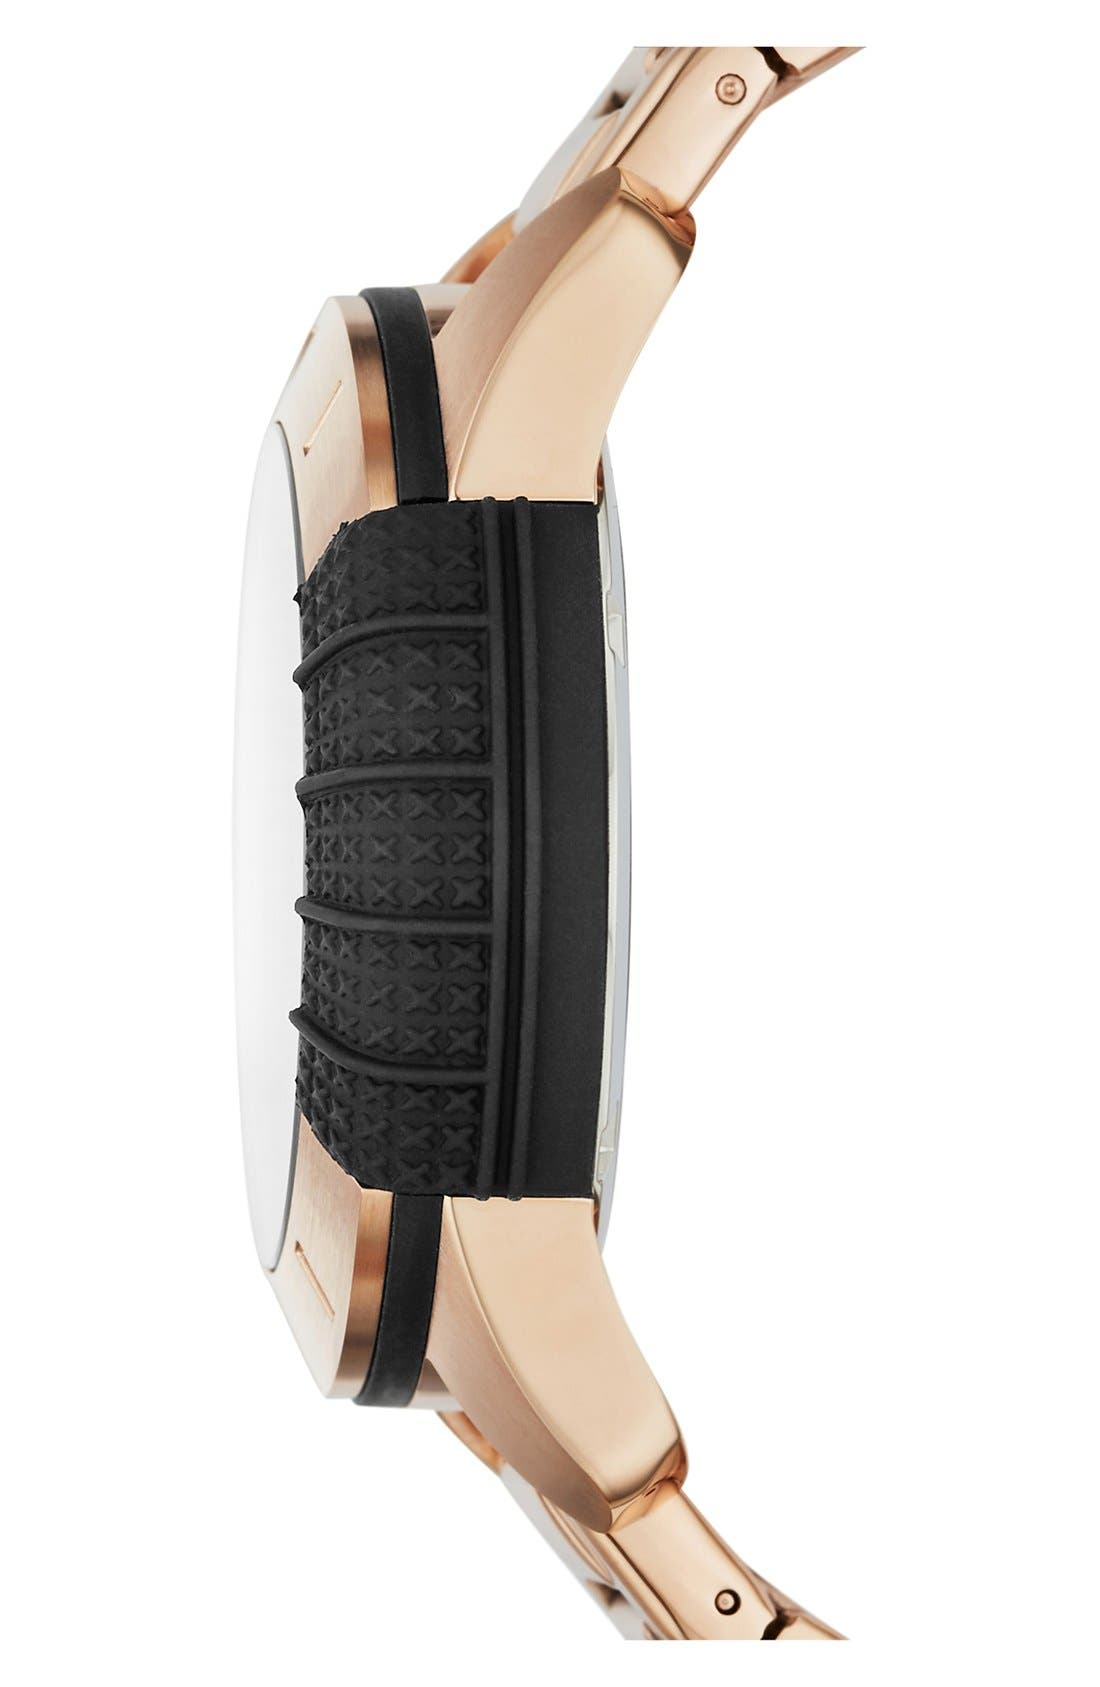 Alternate Image 2  - adidasOriginals 'ADH-1969' Bracelet Watch, 42mm case